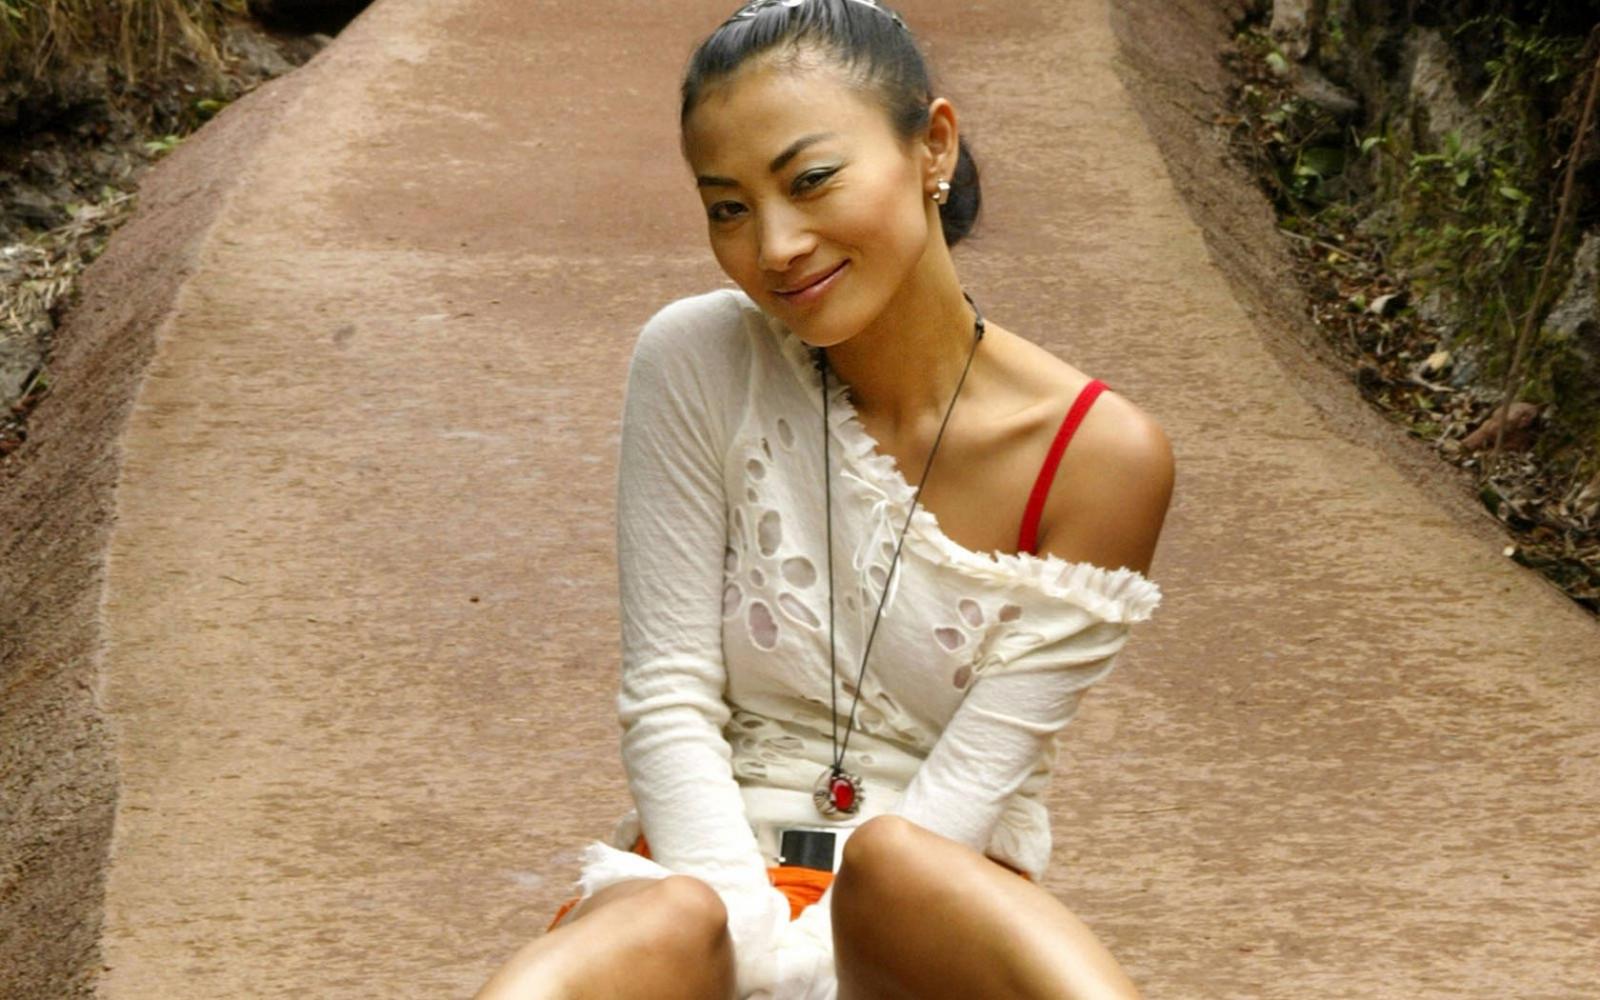 filipina-jadi-leen-bayal-nudes-babes-girl